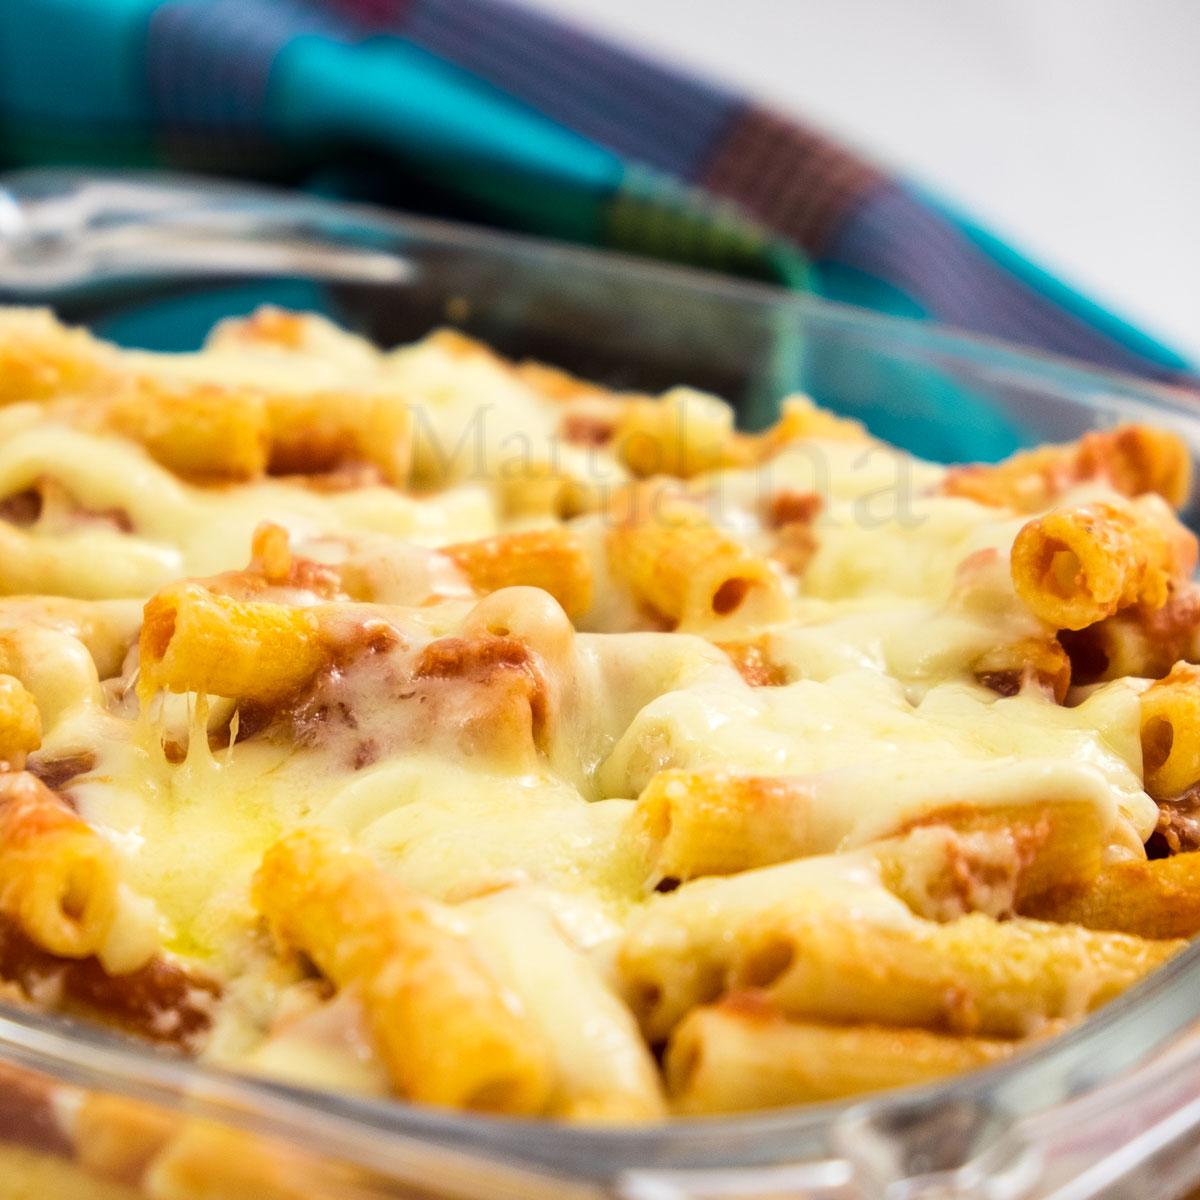 Pasta-forno-pizzaiola-A-1200x1200